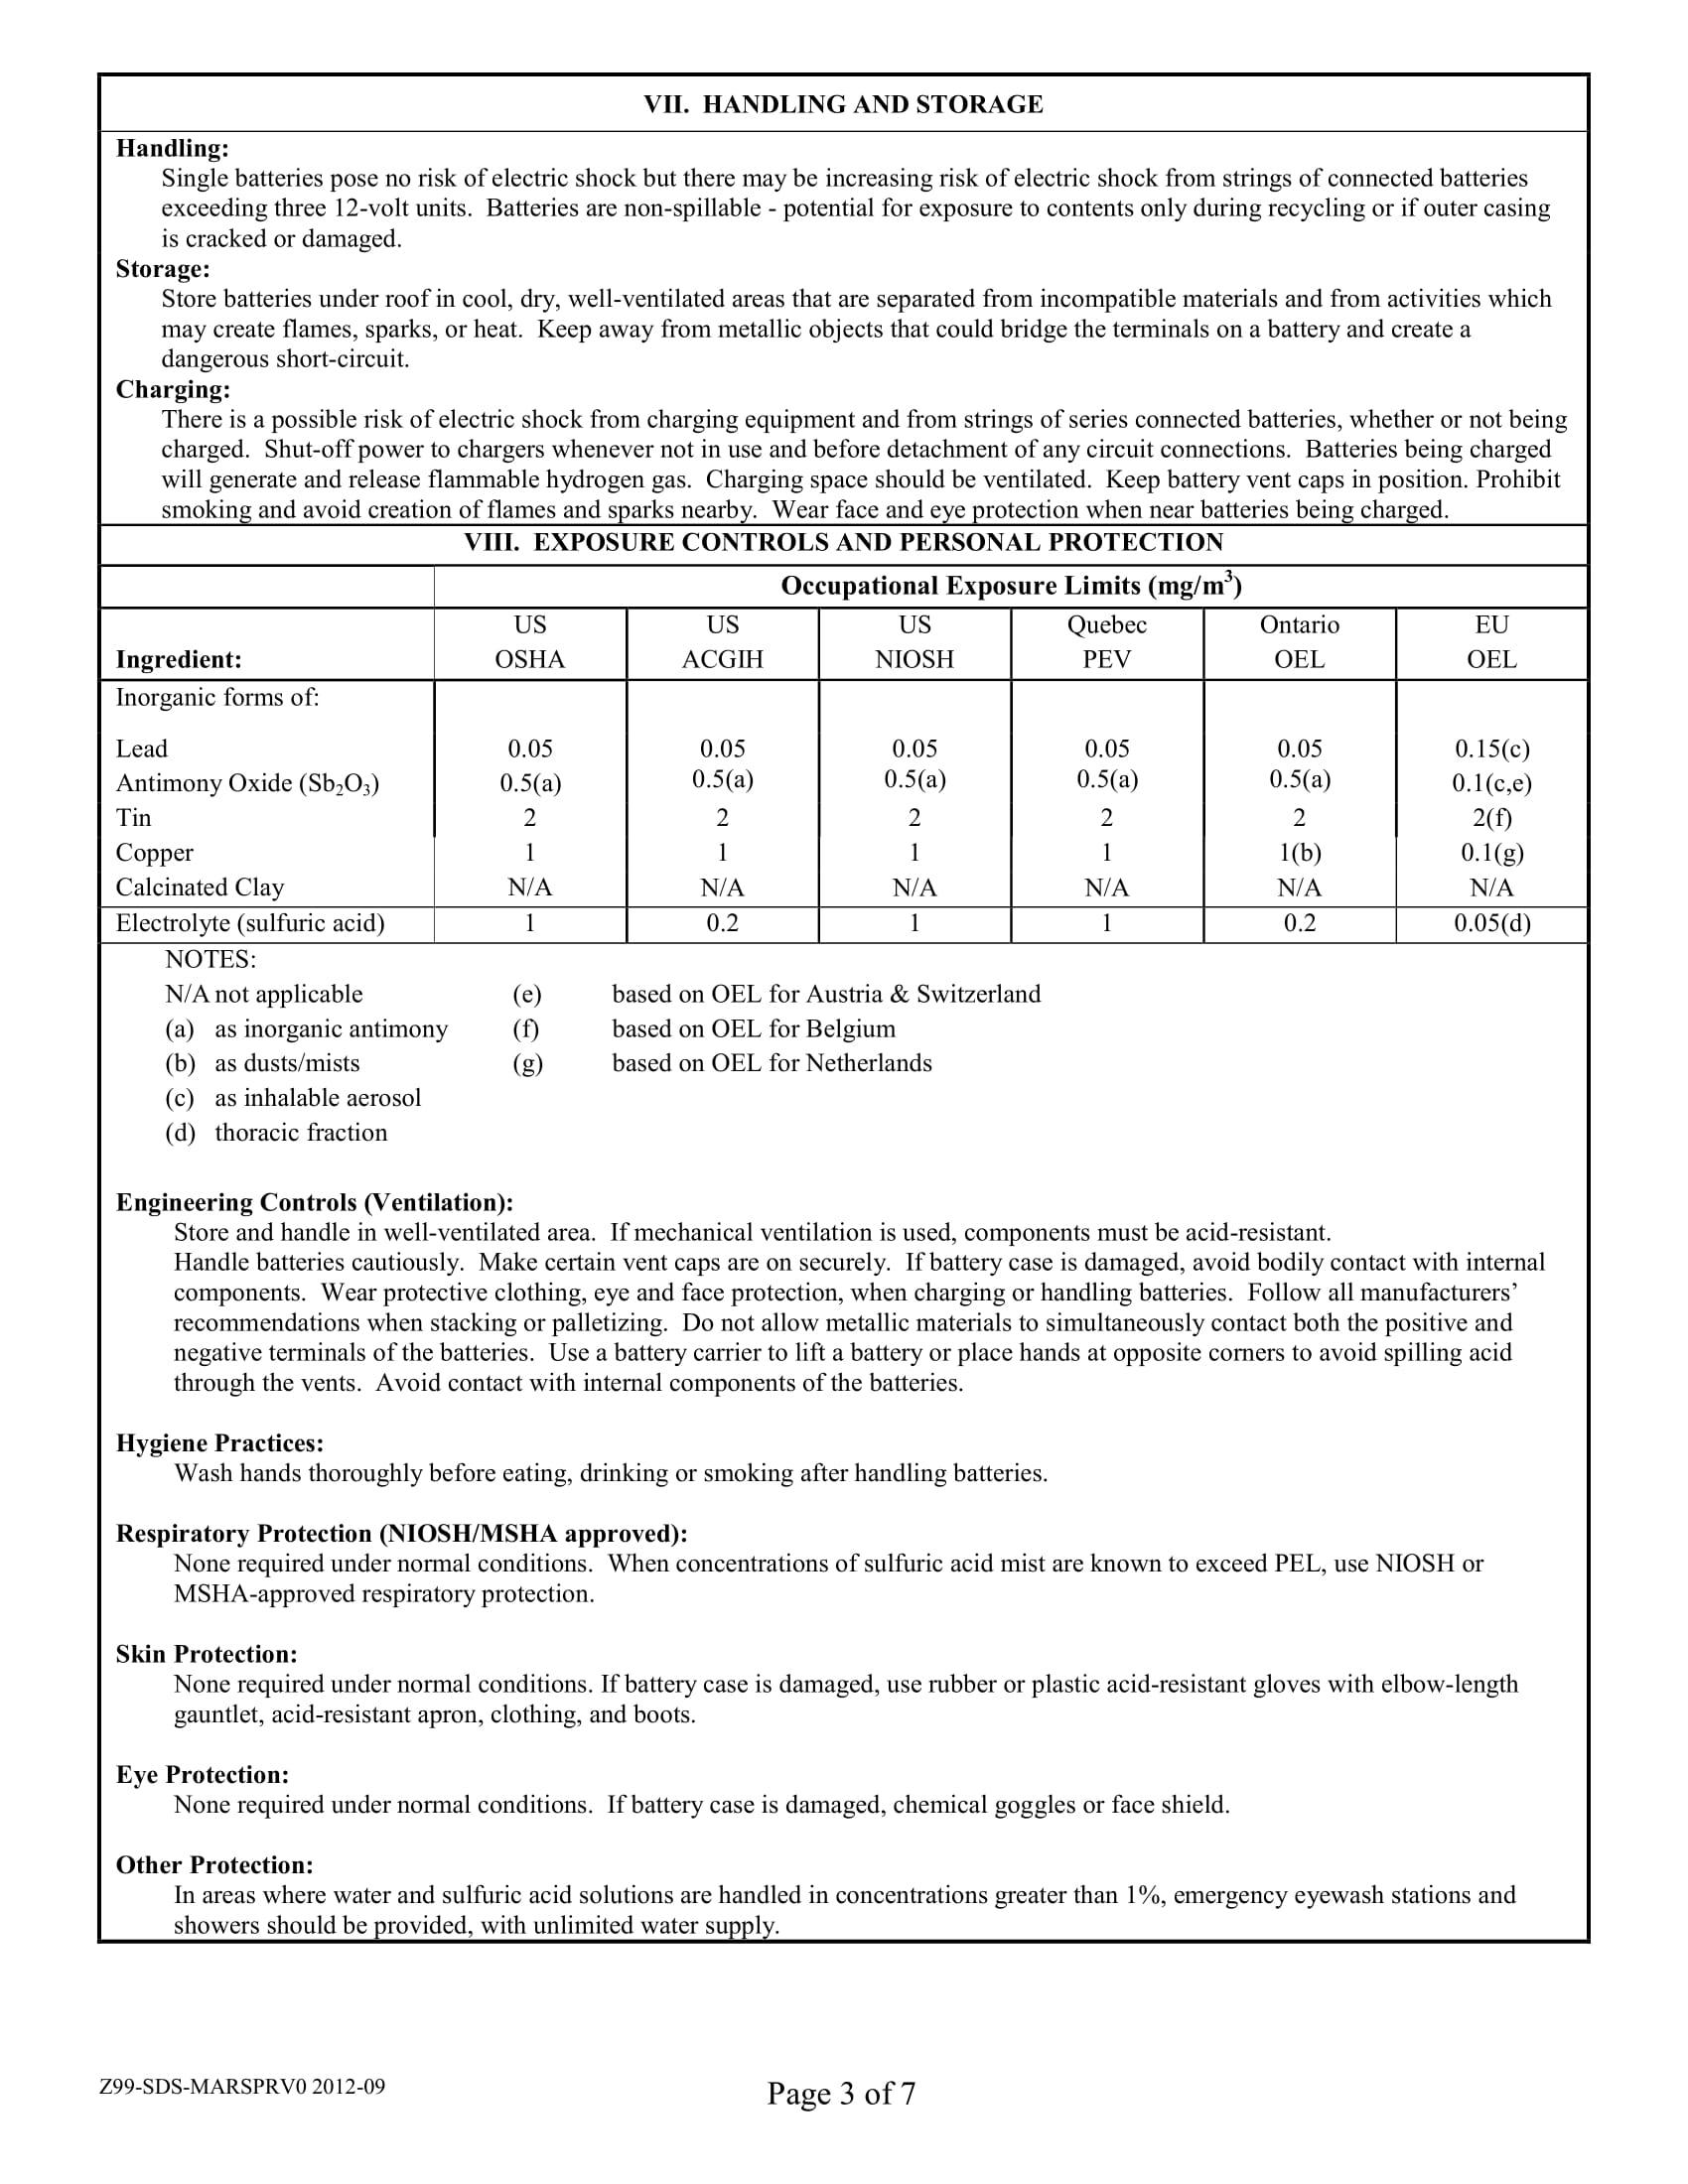 Marathon Batteries Safety Data Sheets